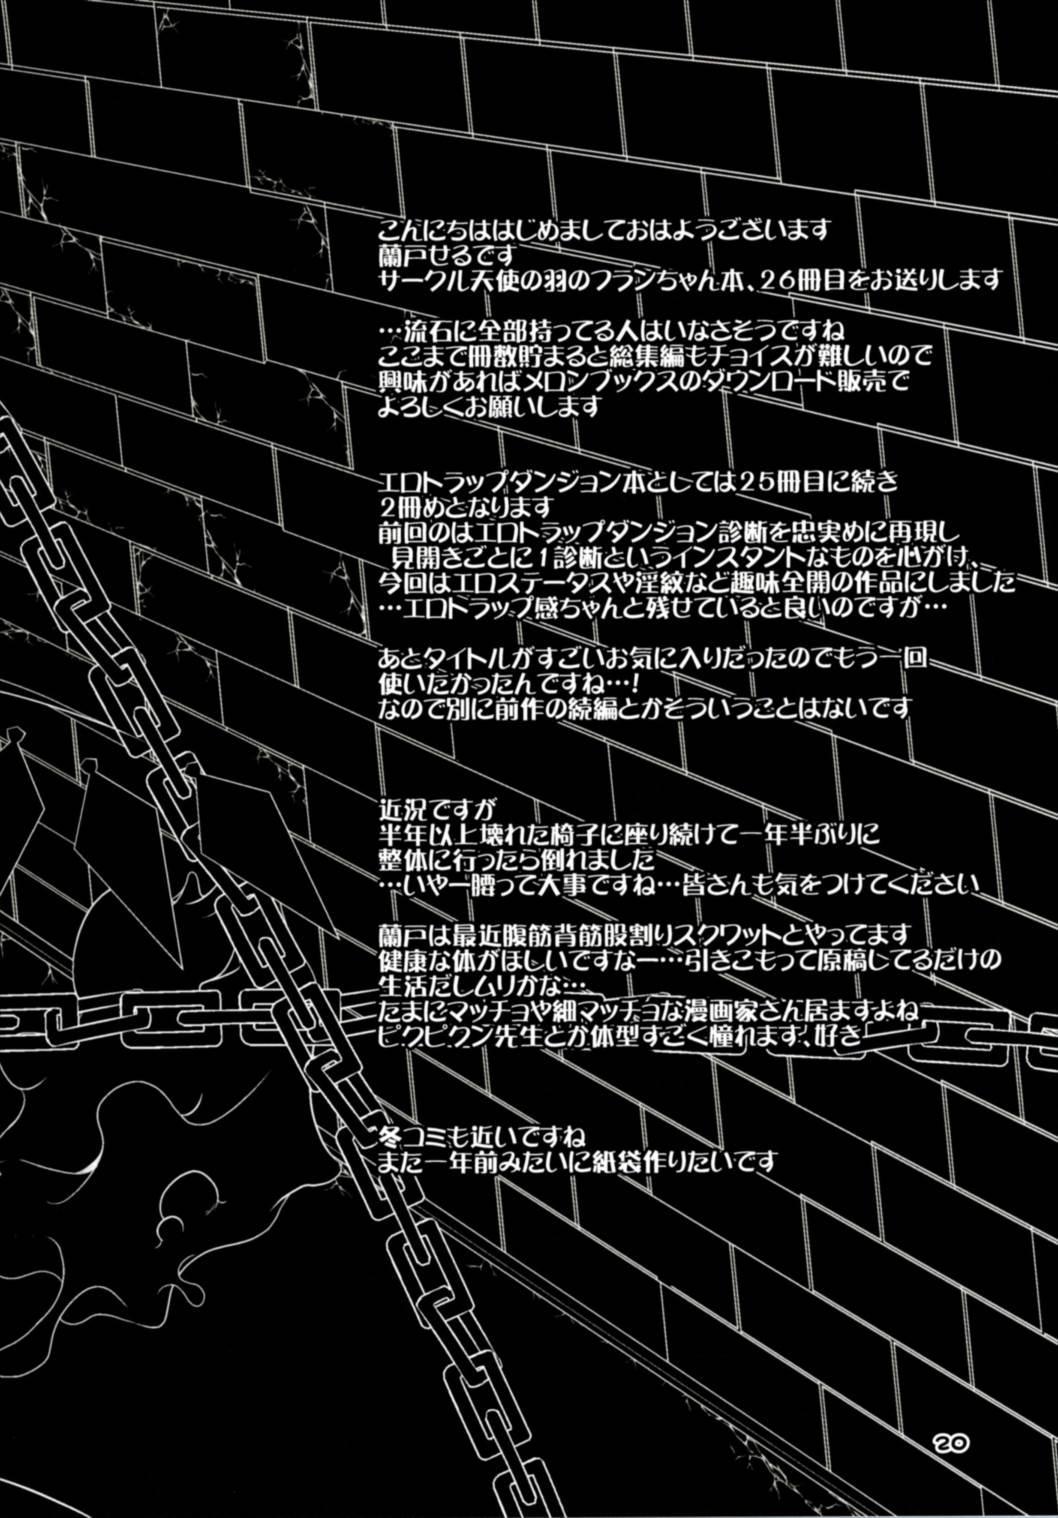 Flan-chan no Ero Trap Dungeon HARDCORE TAIL 18